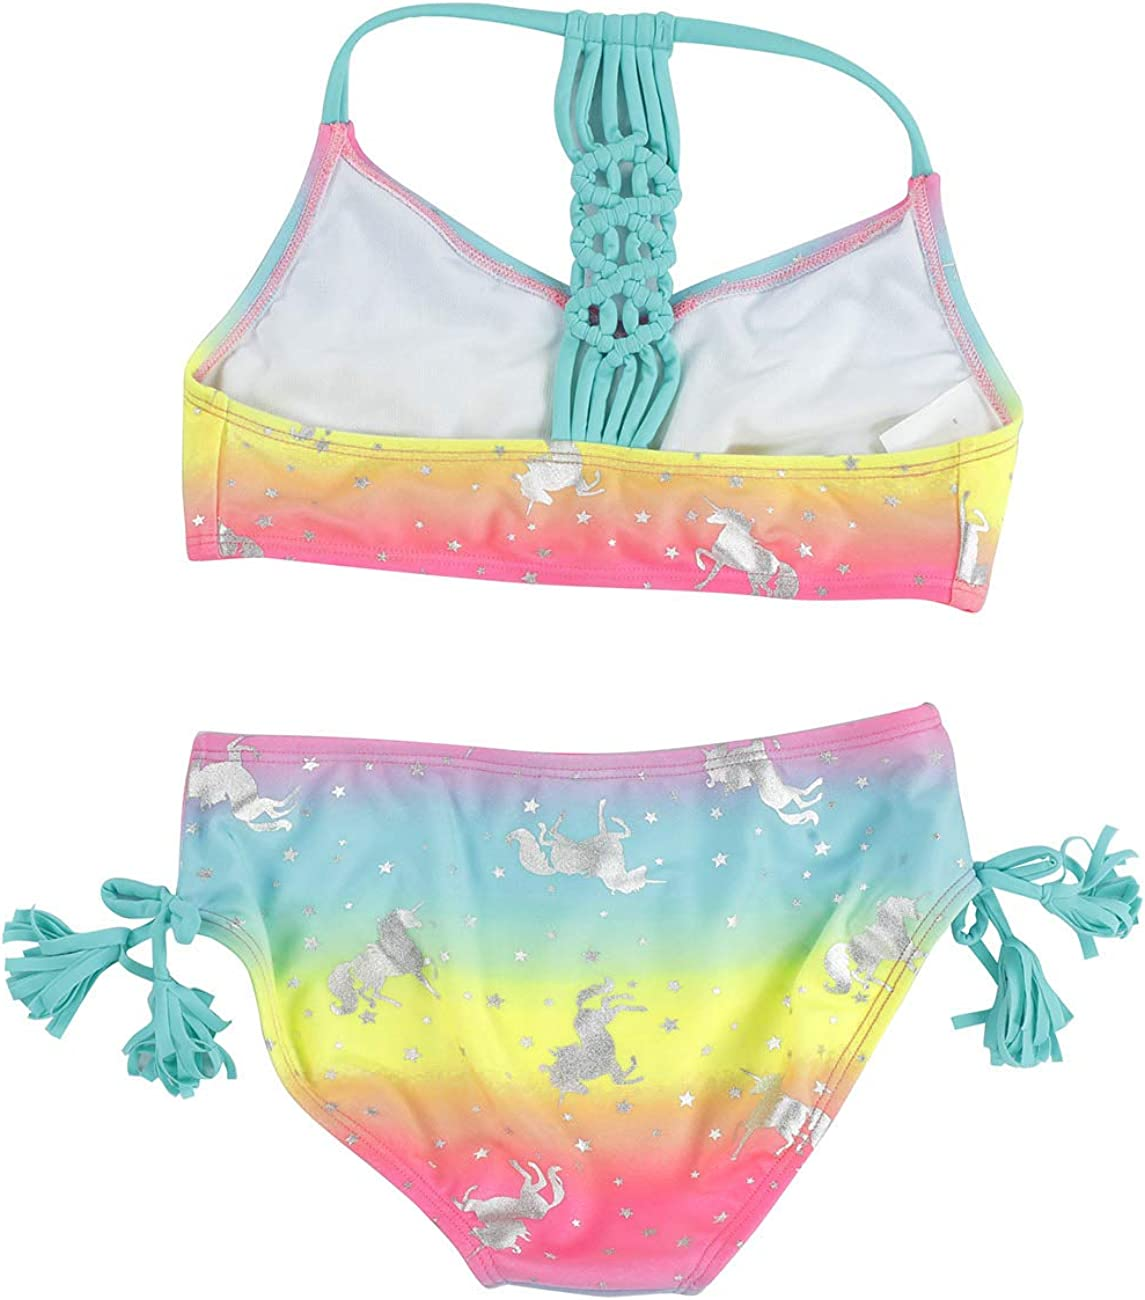 DUSISHIDAN Girls Kids Two Piece Bikini Set Floral 2-Piece Bathing Suits for US 4-14